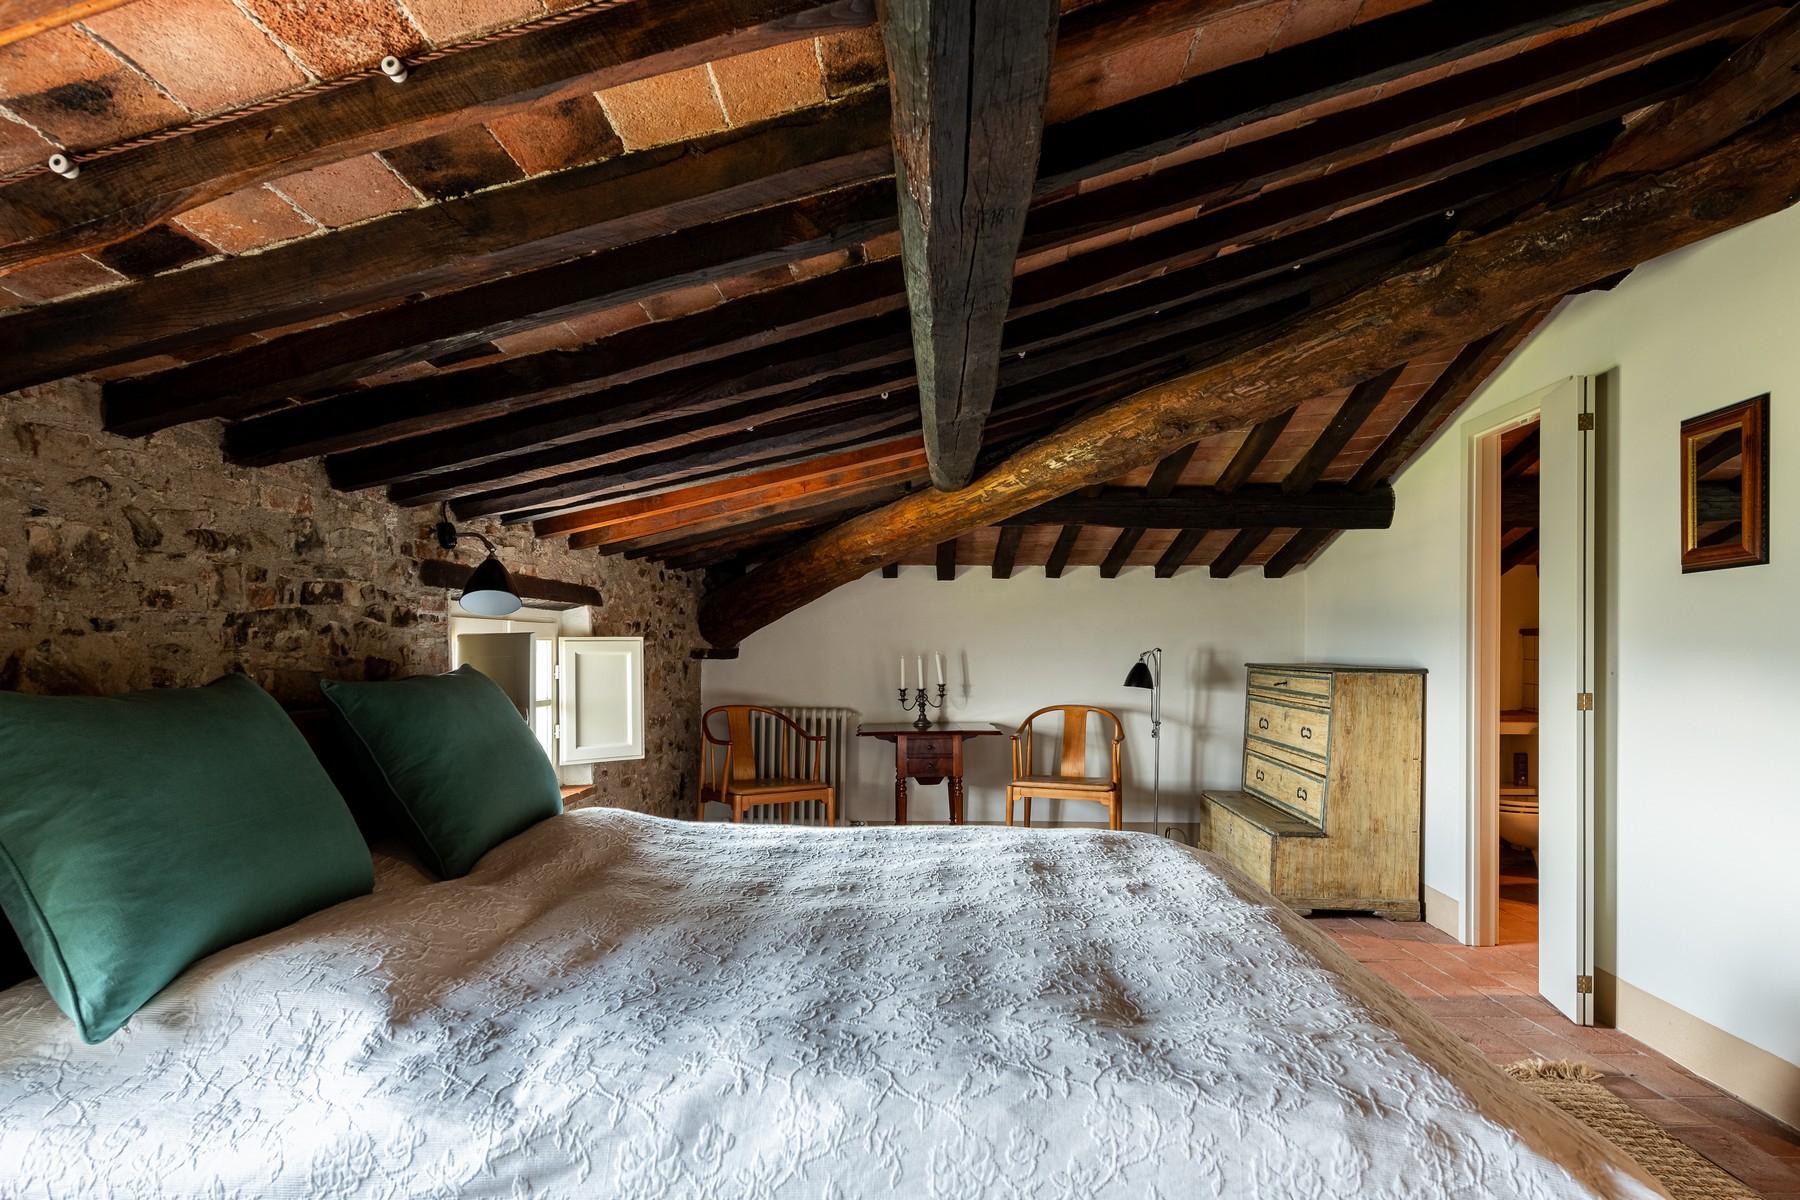 Rustico in Vendita a Lucca: 5 locali, 500 mq - Foto 11